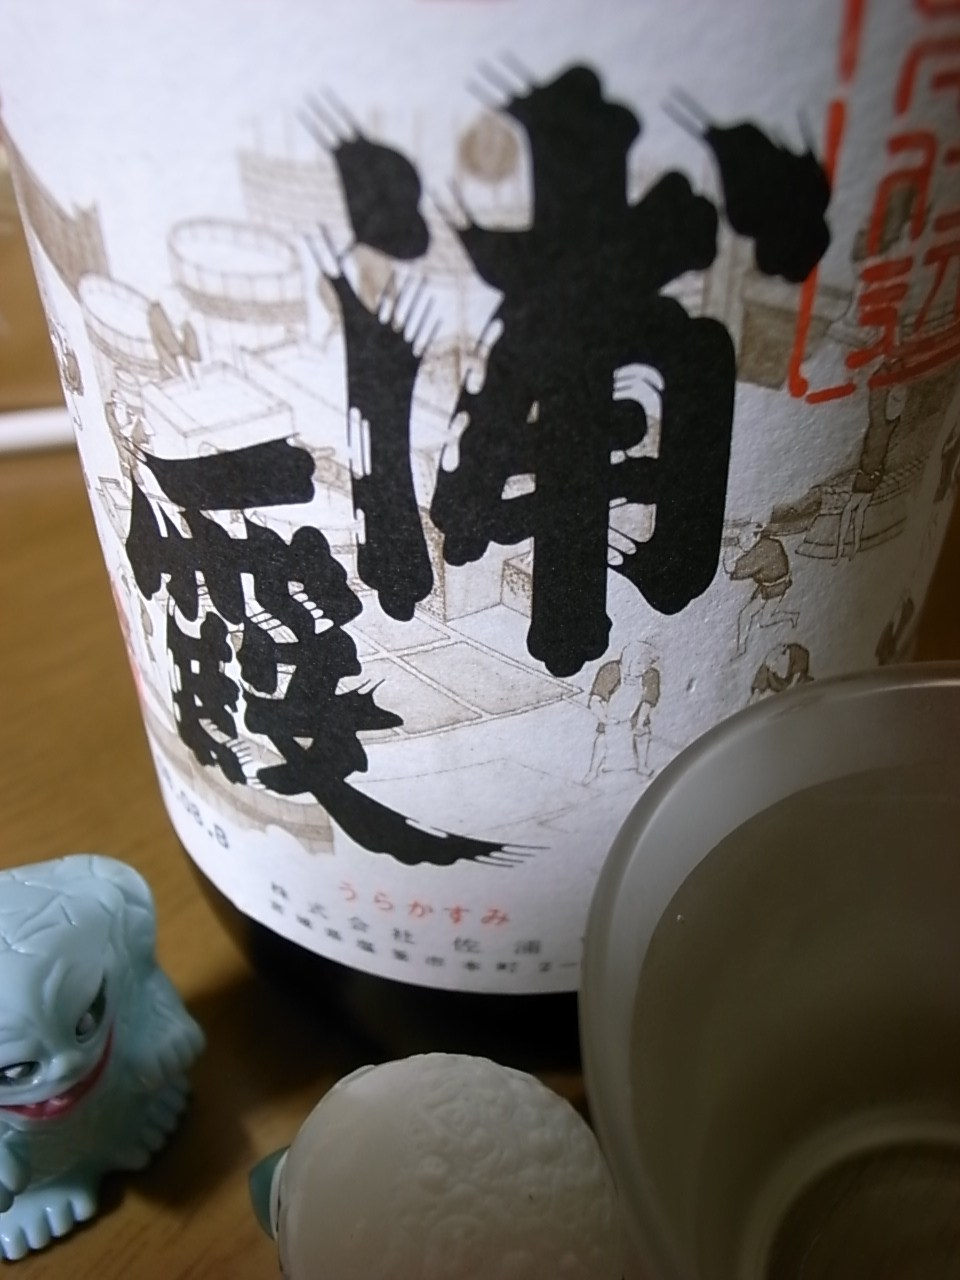 03_r0010894